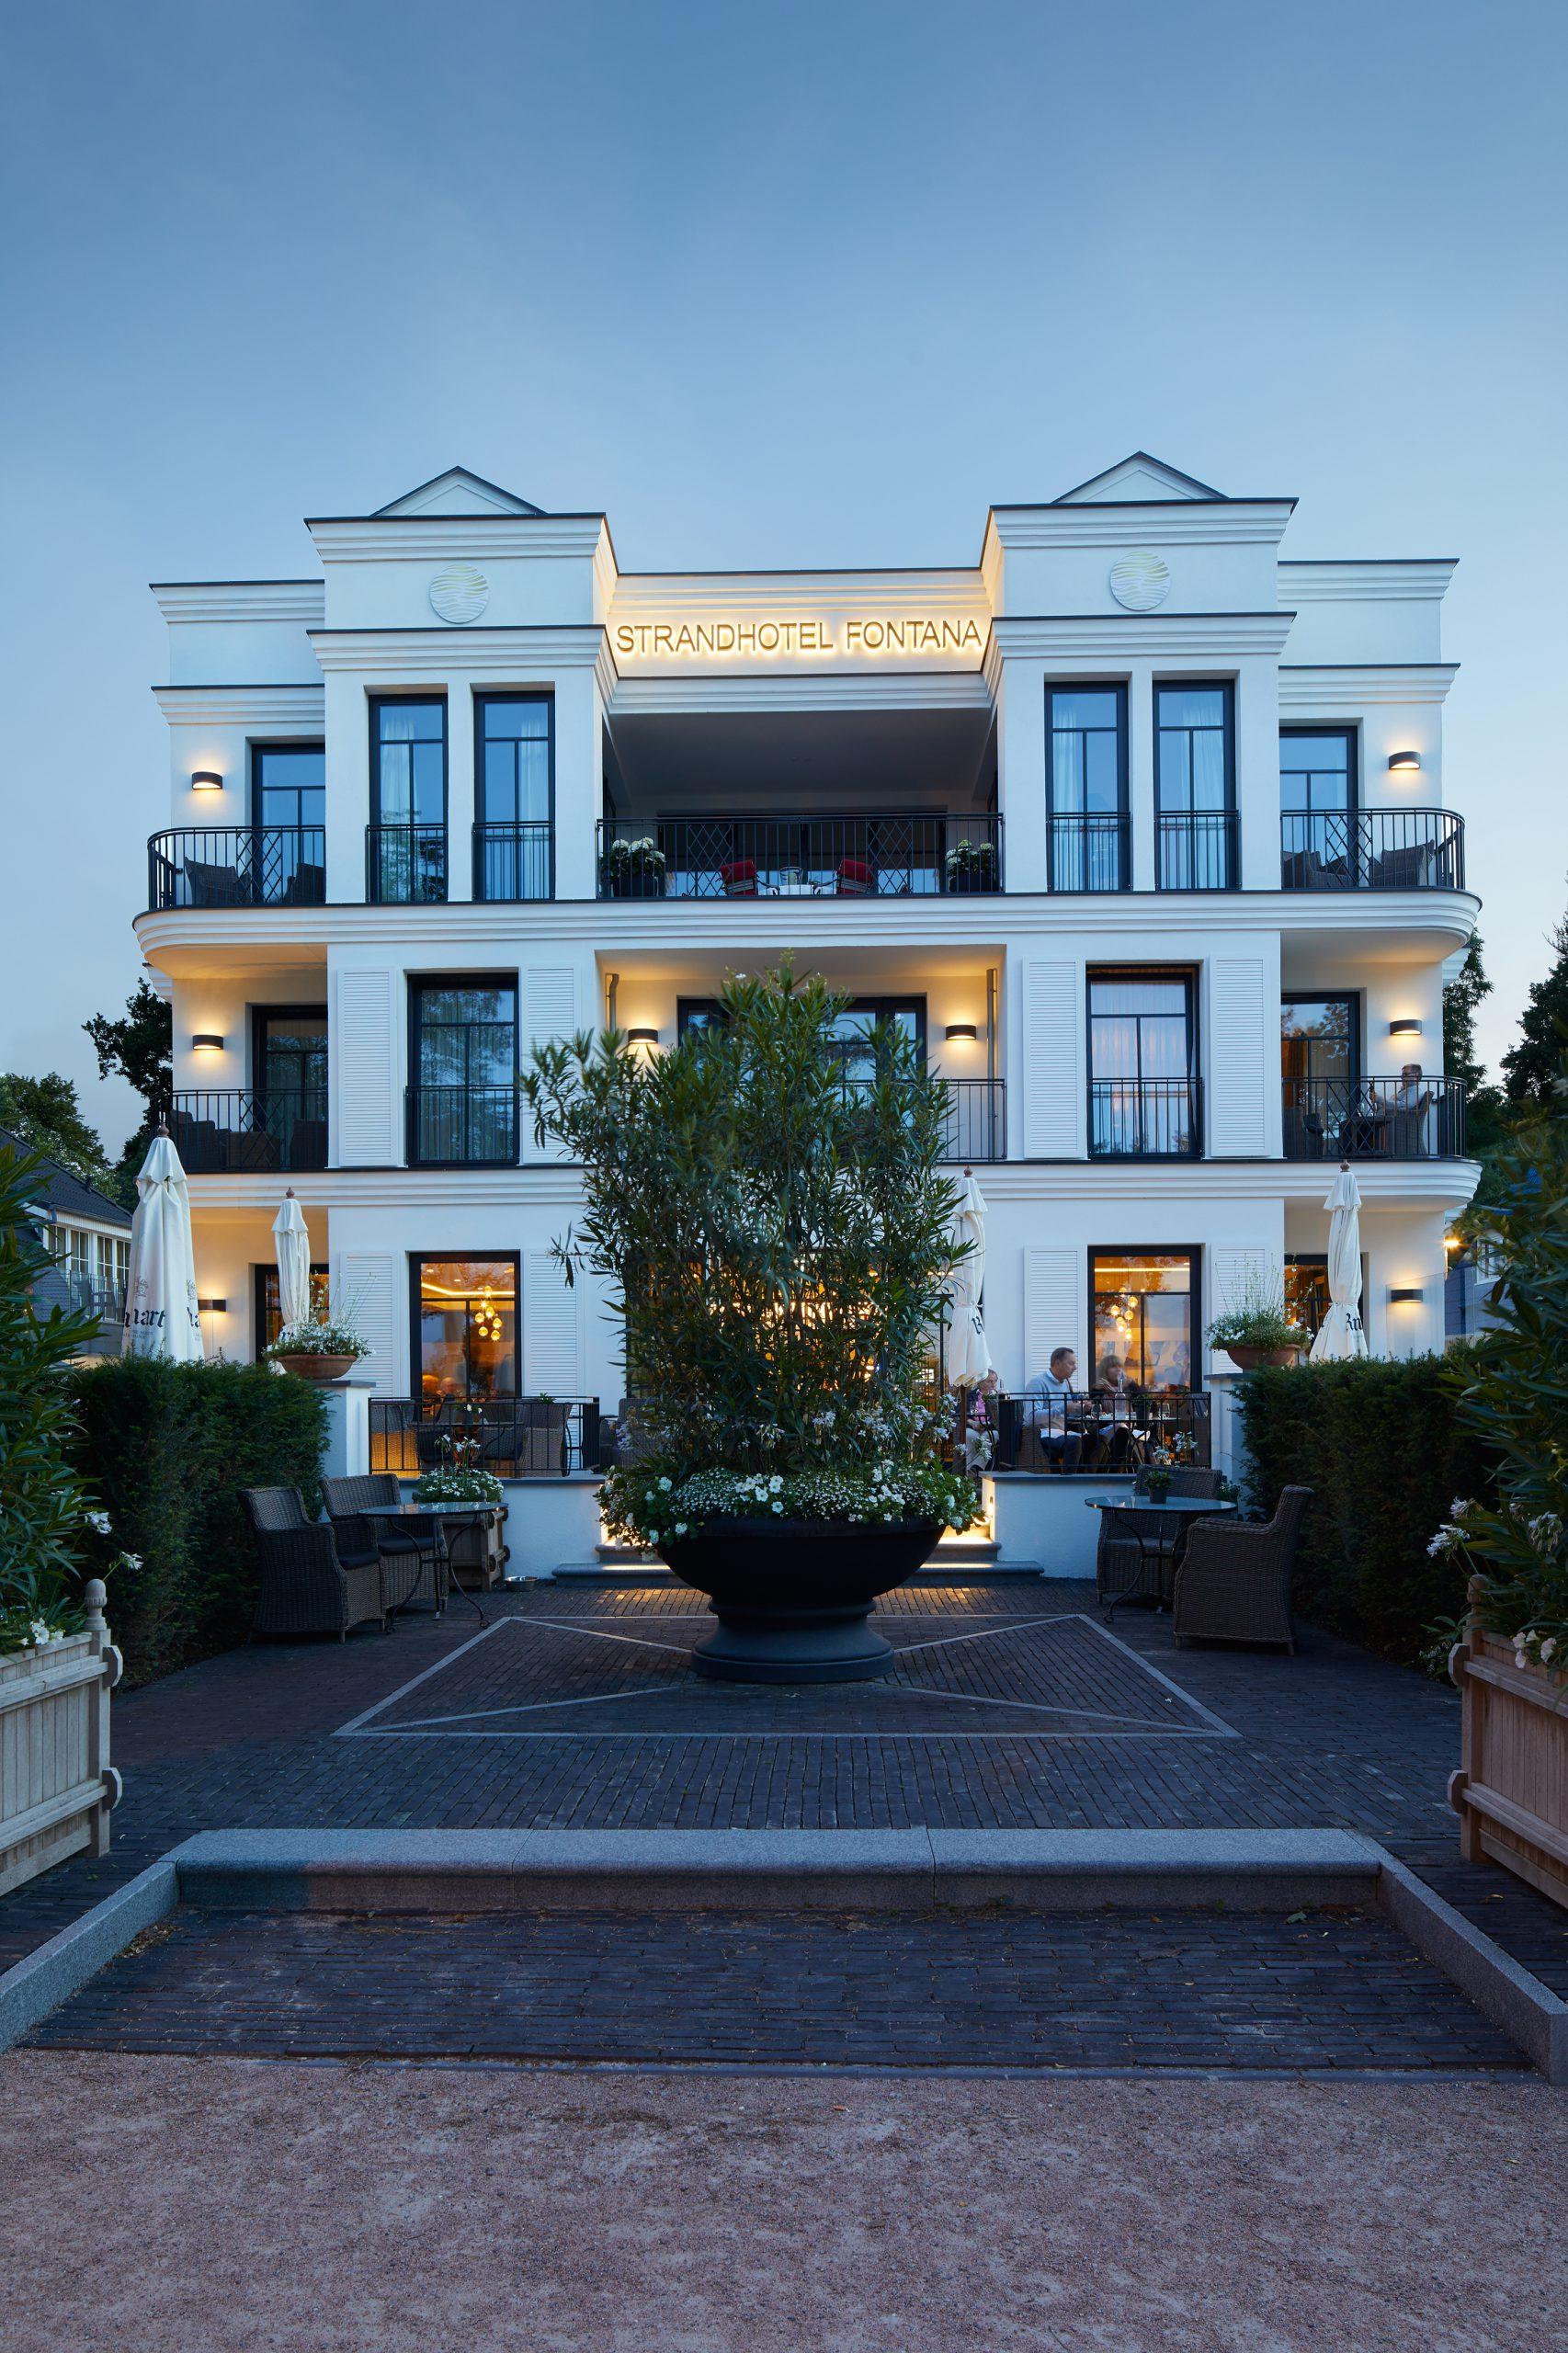 Strandhotel Fontana in Corona-Krise